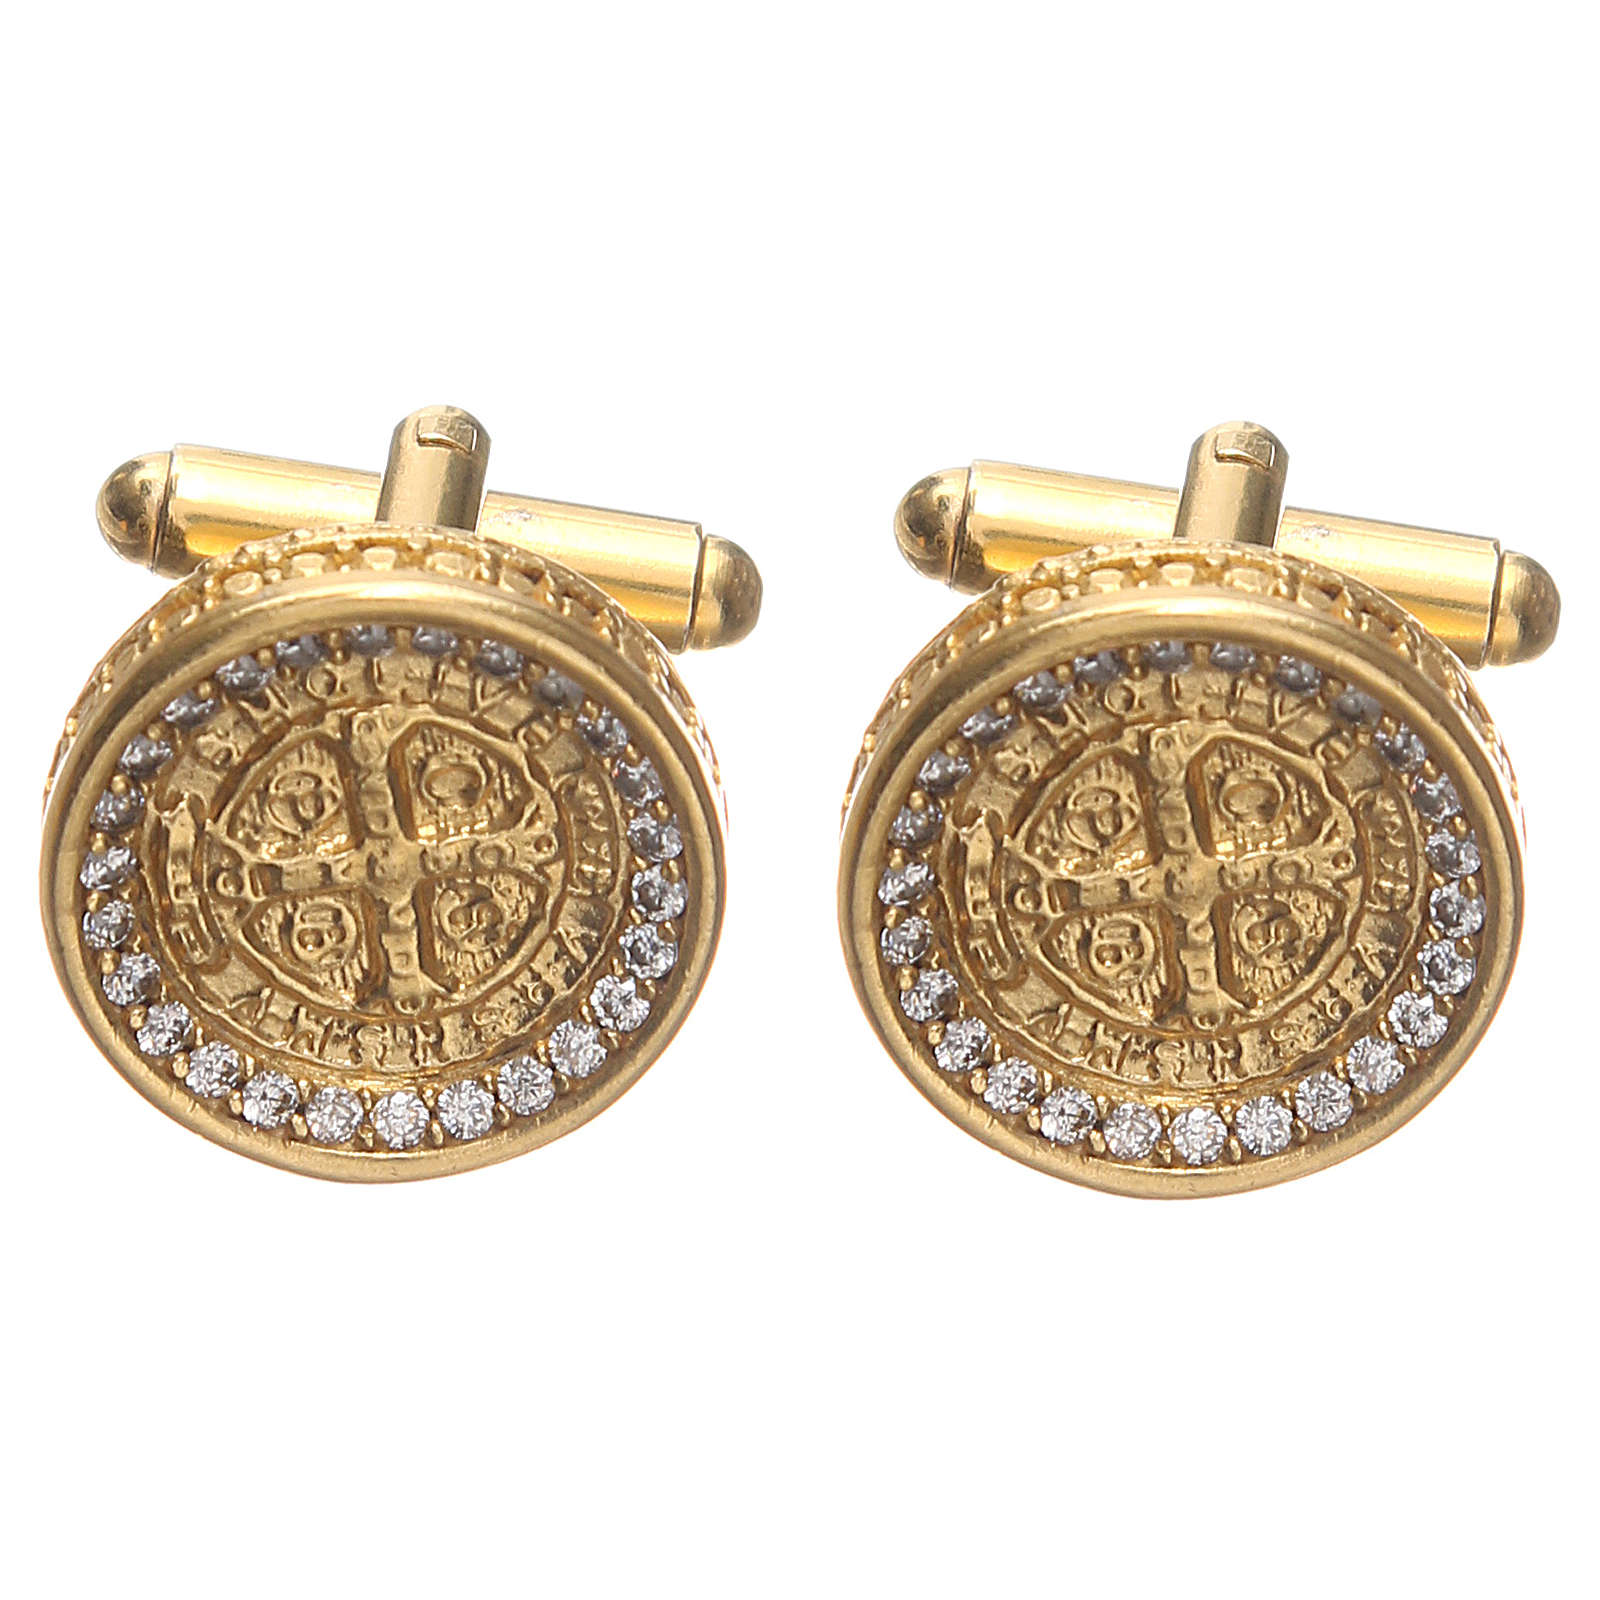 Gemelos para camisa latón dorado Cruz de San Benito 1,7 cm 4